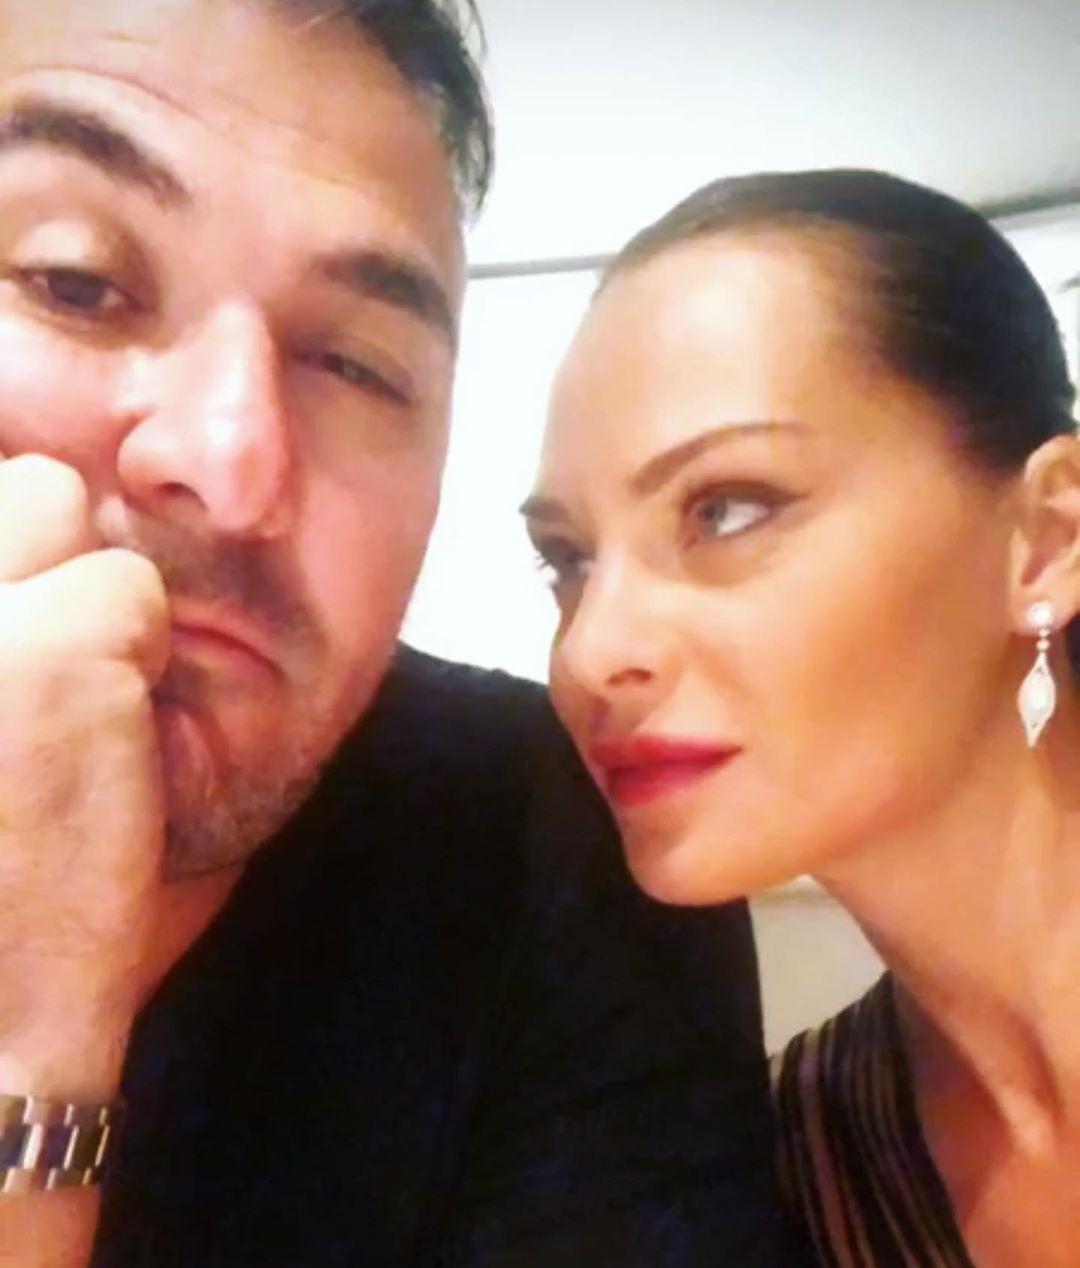 H selfie του Αντώνη Ρέμου με την σύζυγό του Υβόννη Μπόσνιακ